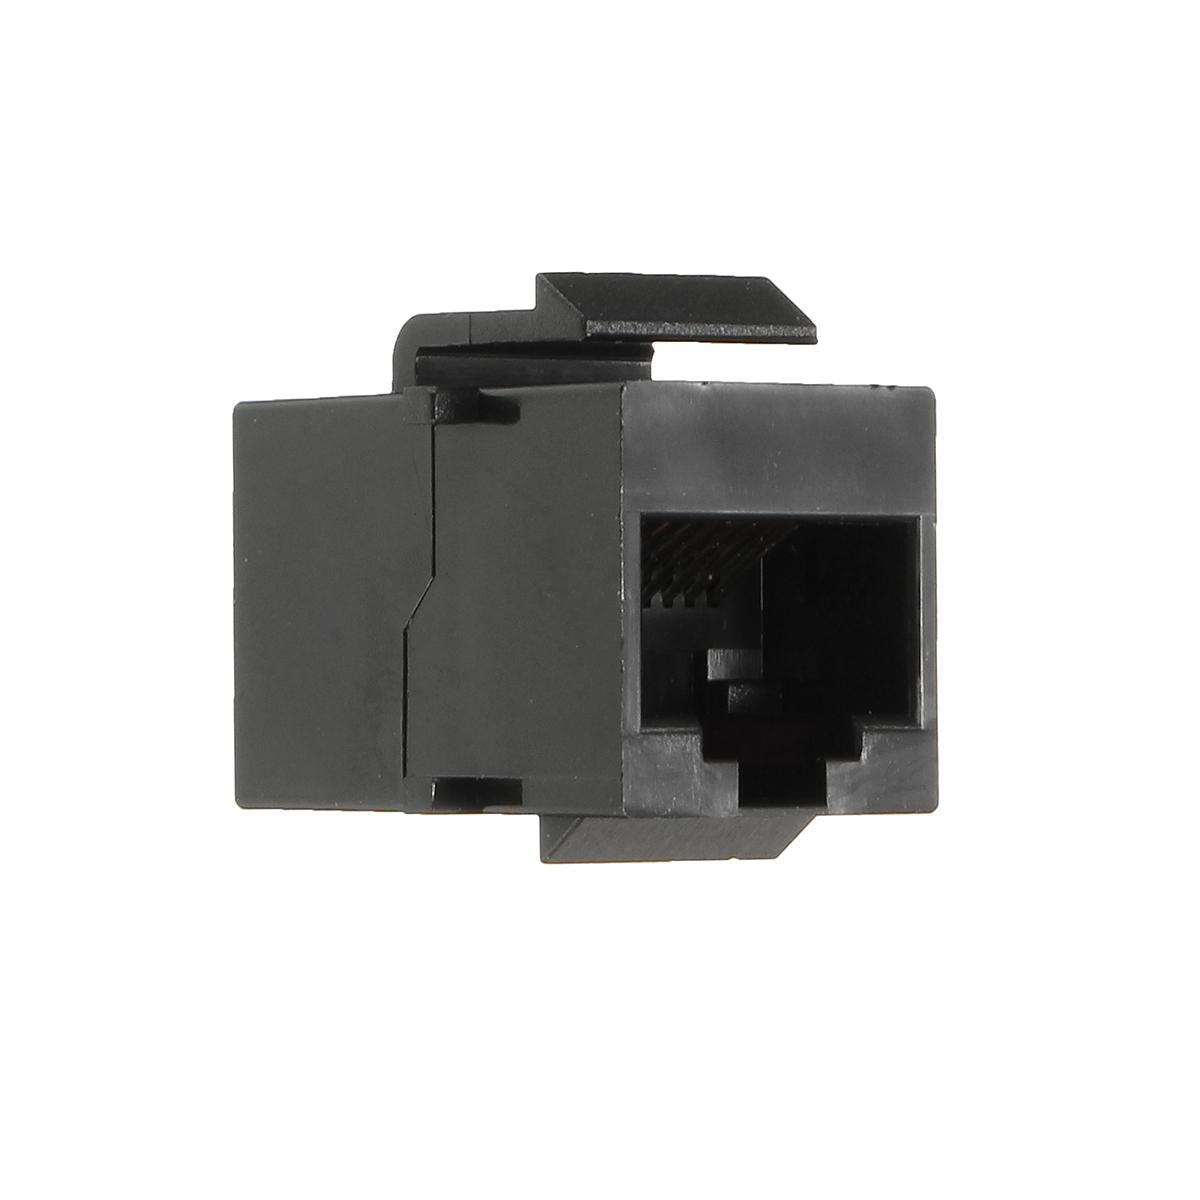 Female Cat6 8p8c RJ45 Gigabit Coupler Network Adapter Shielded Panel Plug 1PC